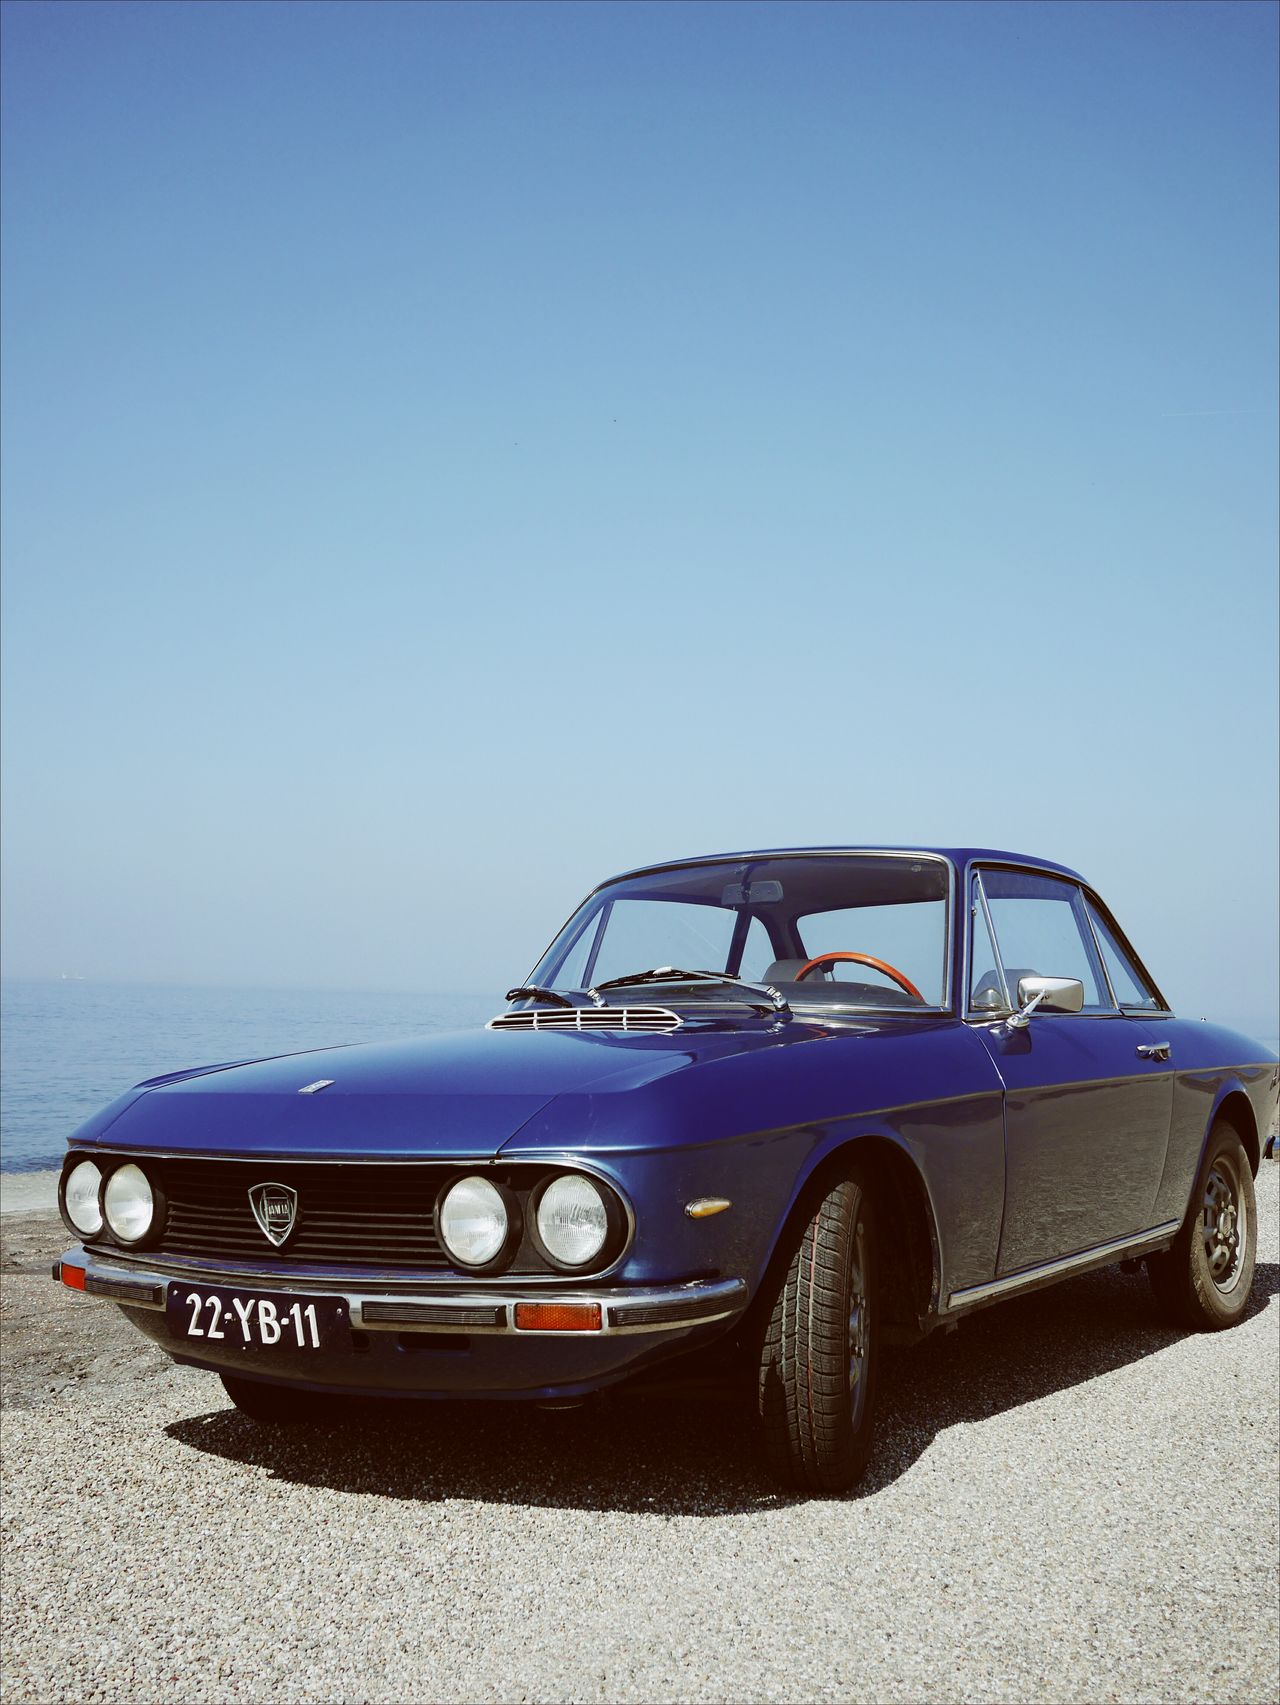 Blue Car Old-fashioned Racecar Outdoors Motorsport Lancia Oldtimer Sea Seaside Blue Sky